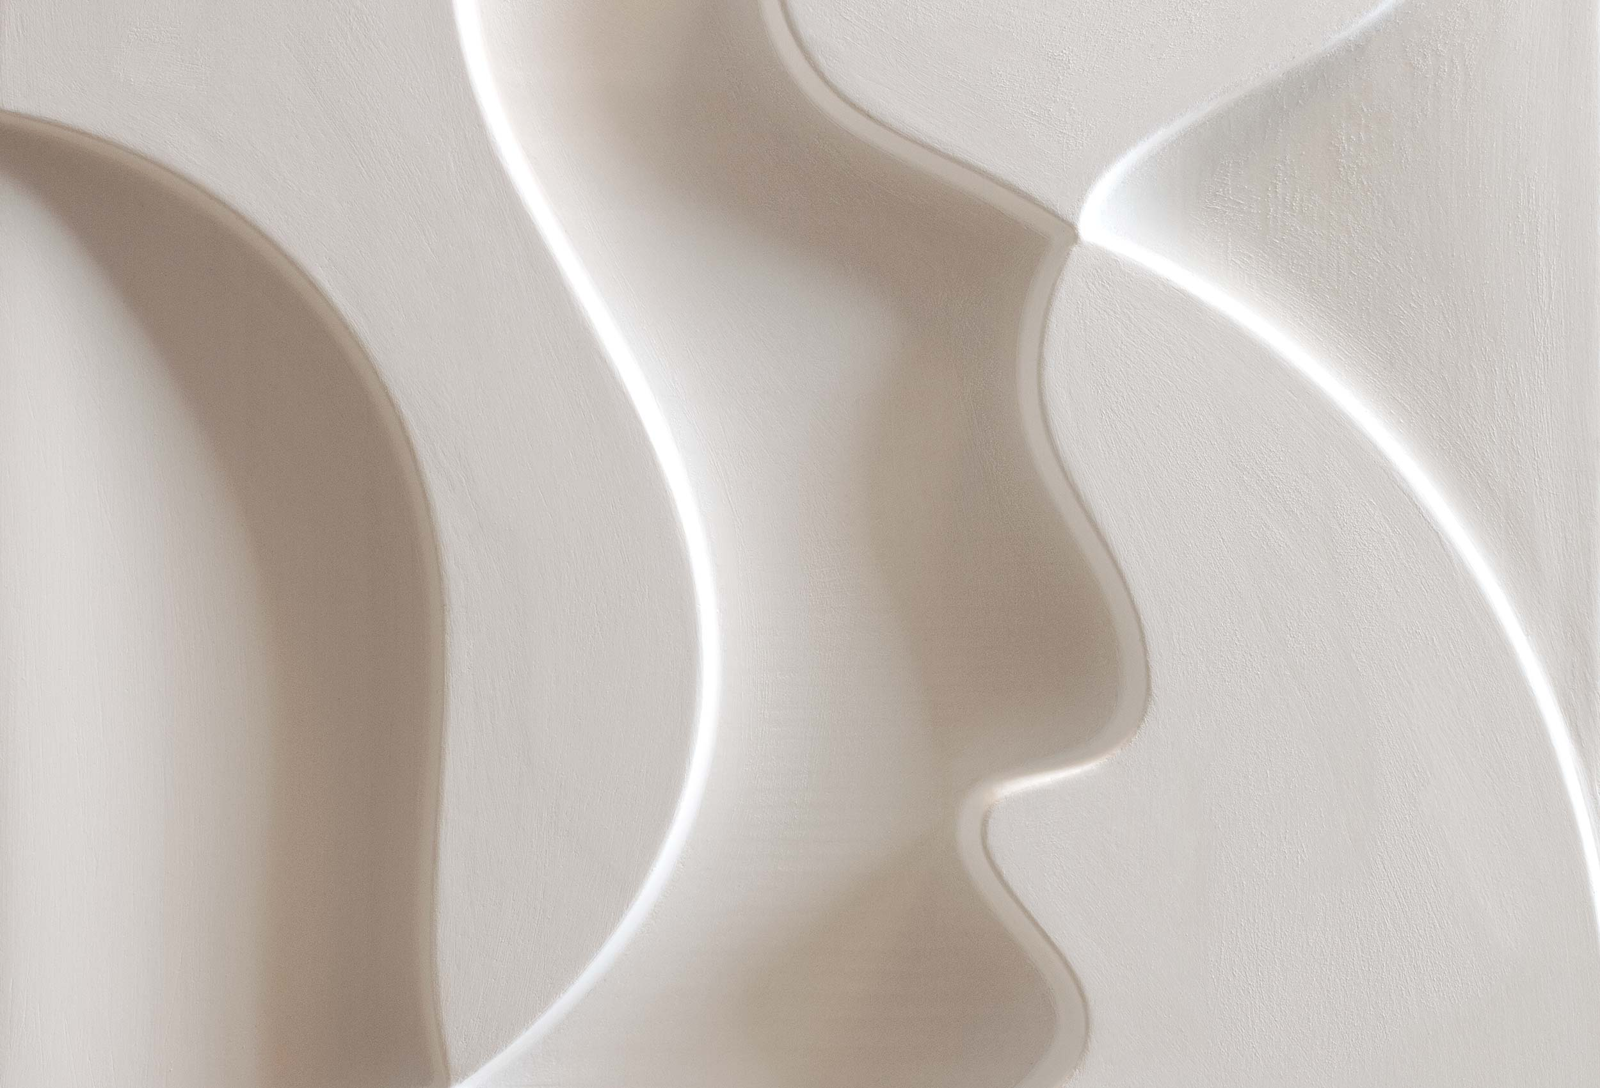 Image of Silhouettes · Plaster Artwork